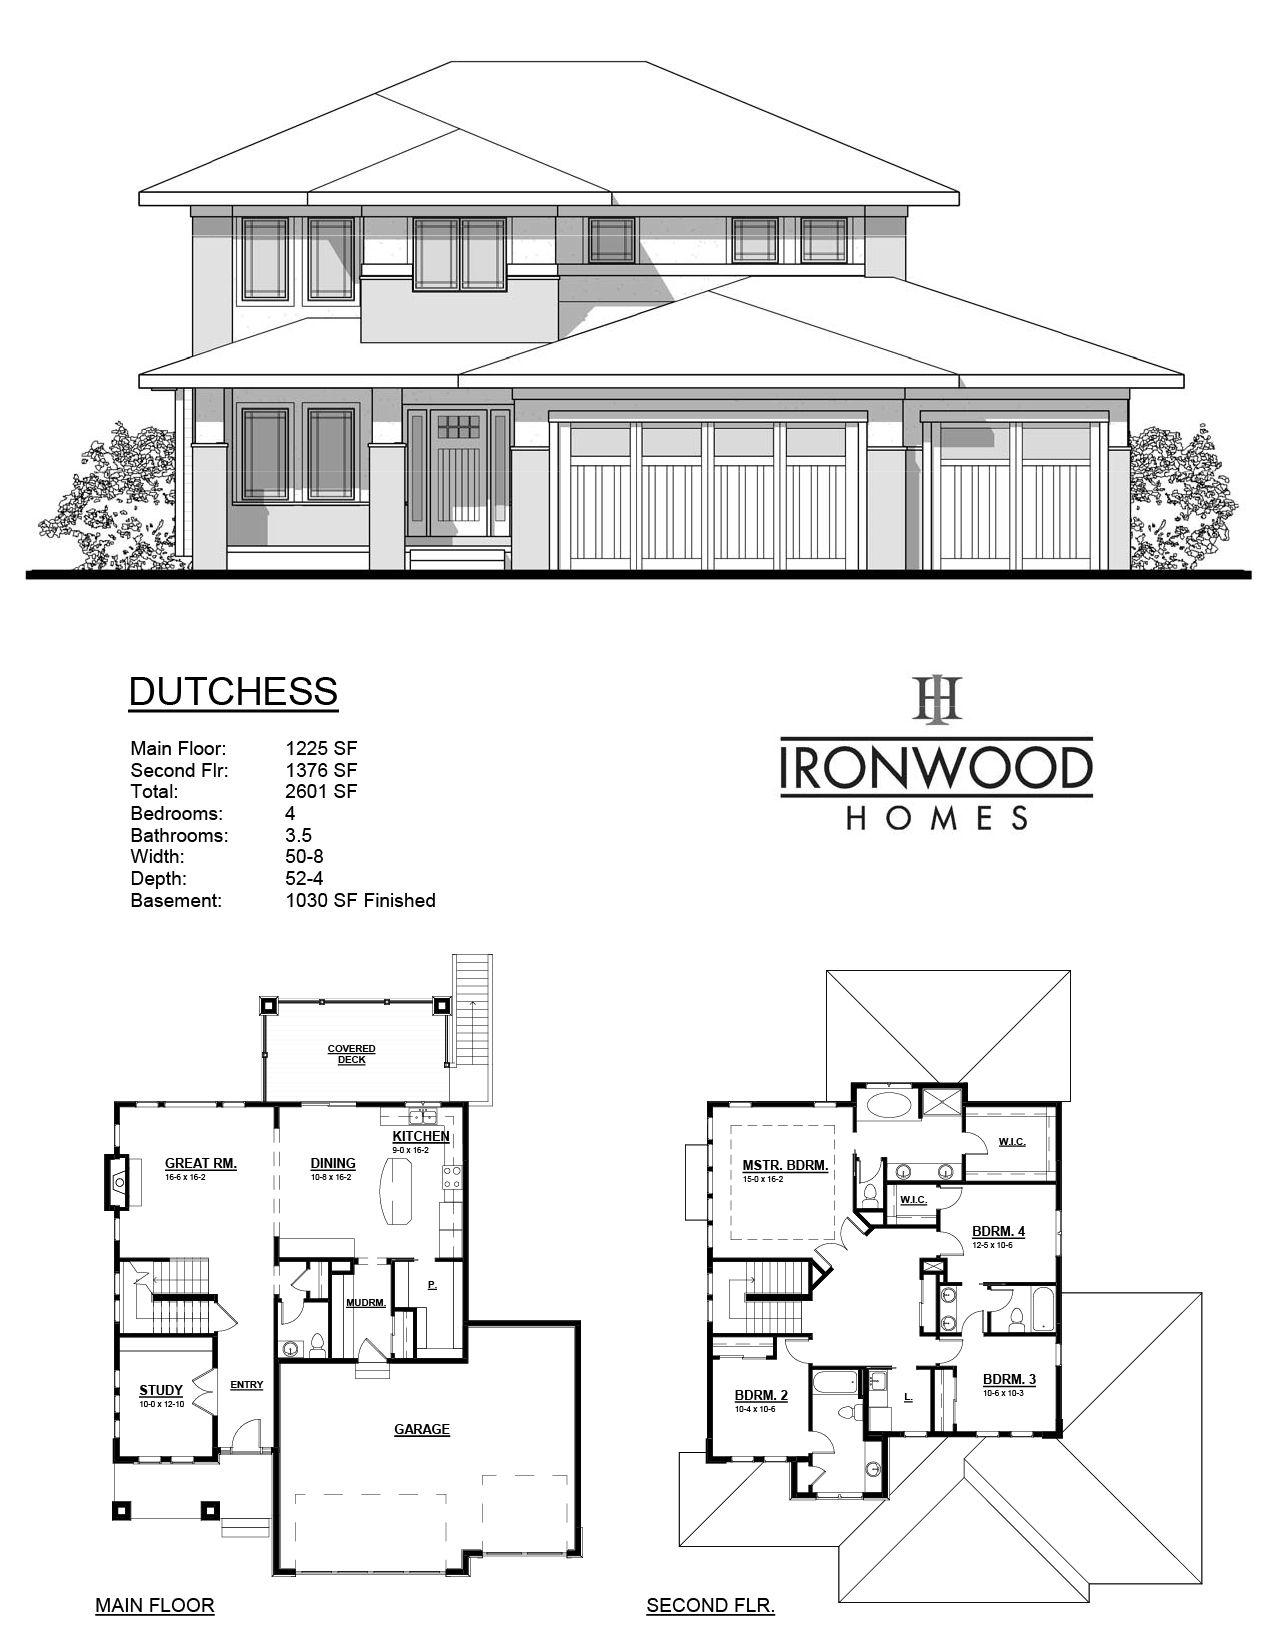 Dutchess Floor Plan Info Sheet Architectural House Plans My House Plans Dream House Plans